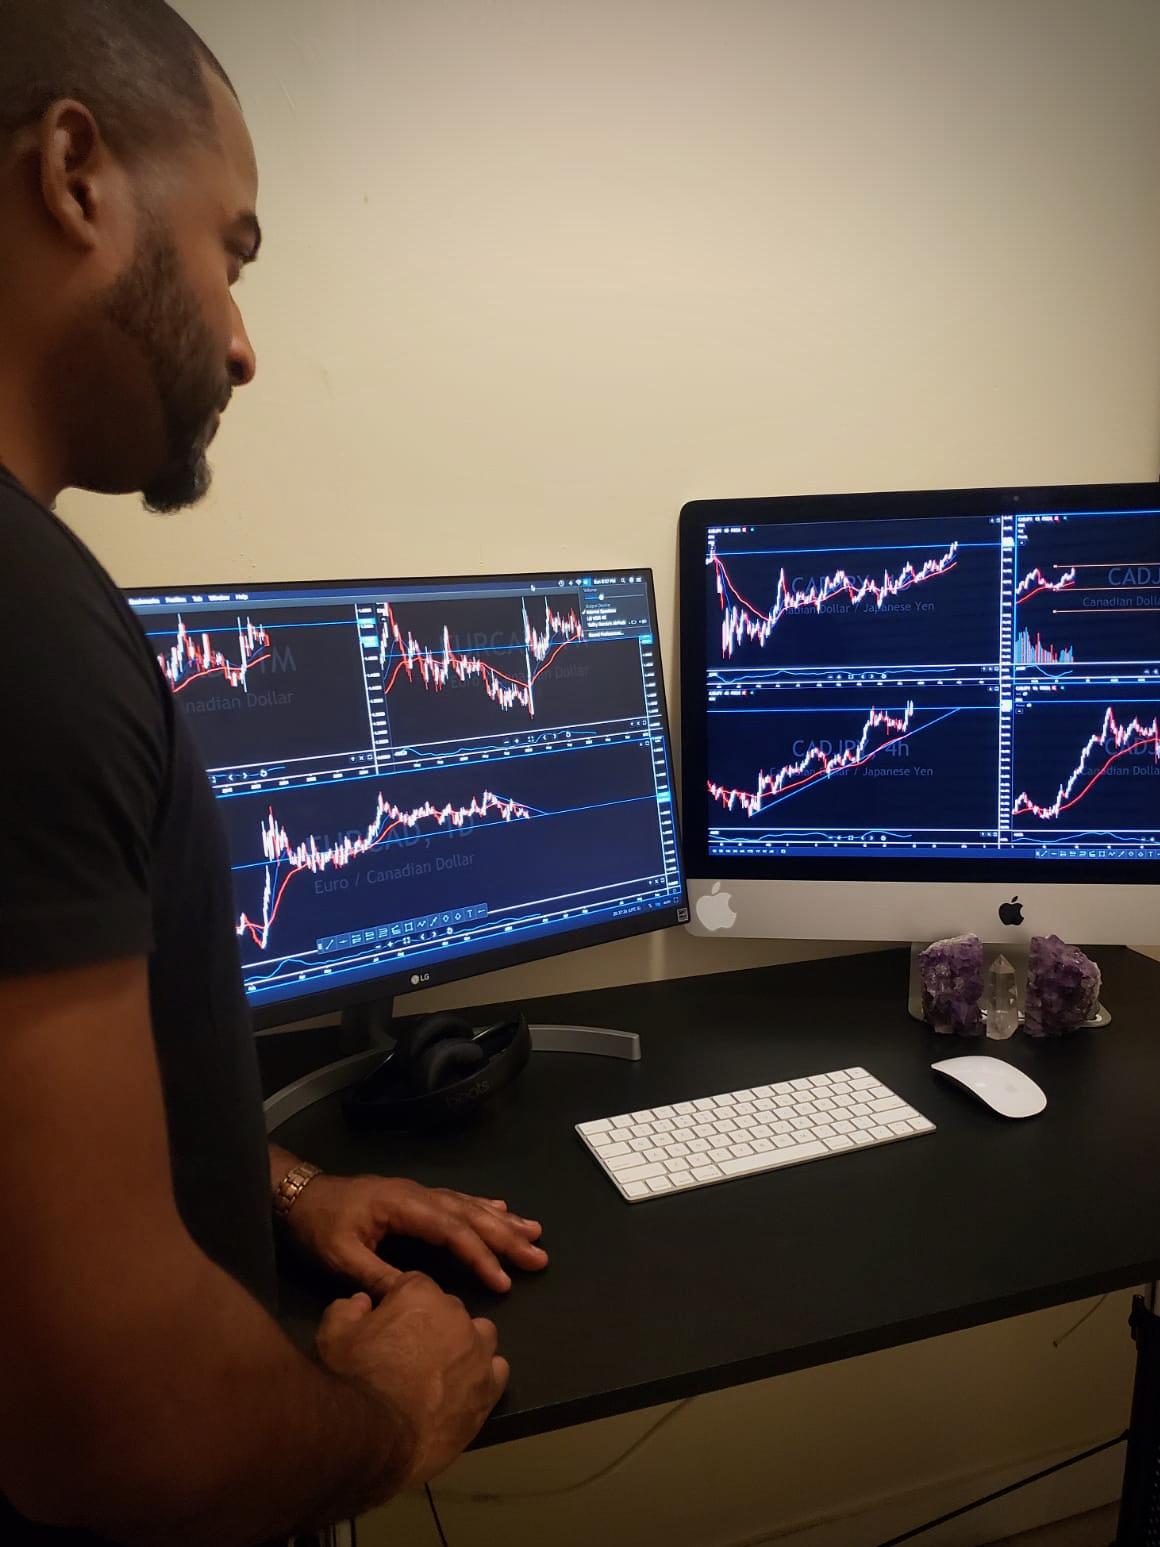 Yeifry's trading setup